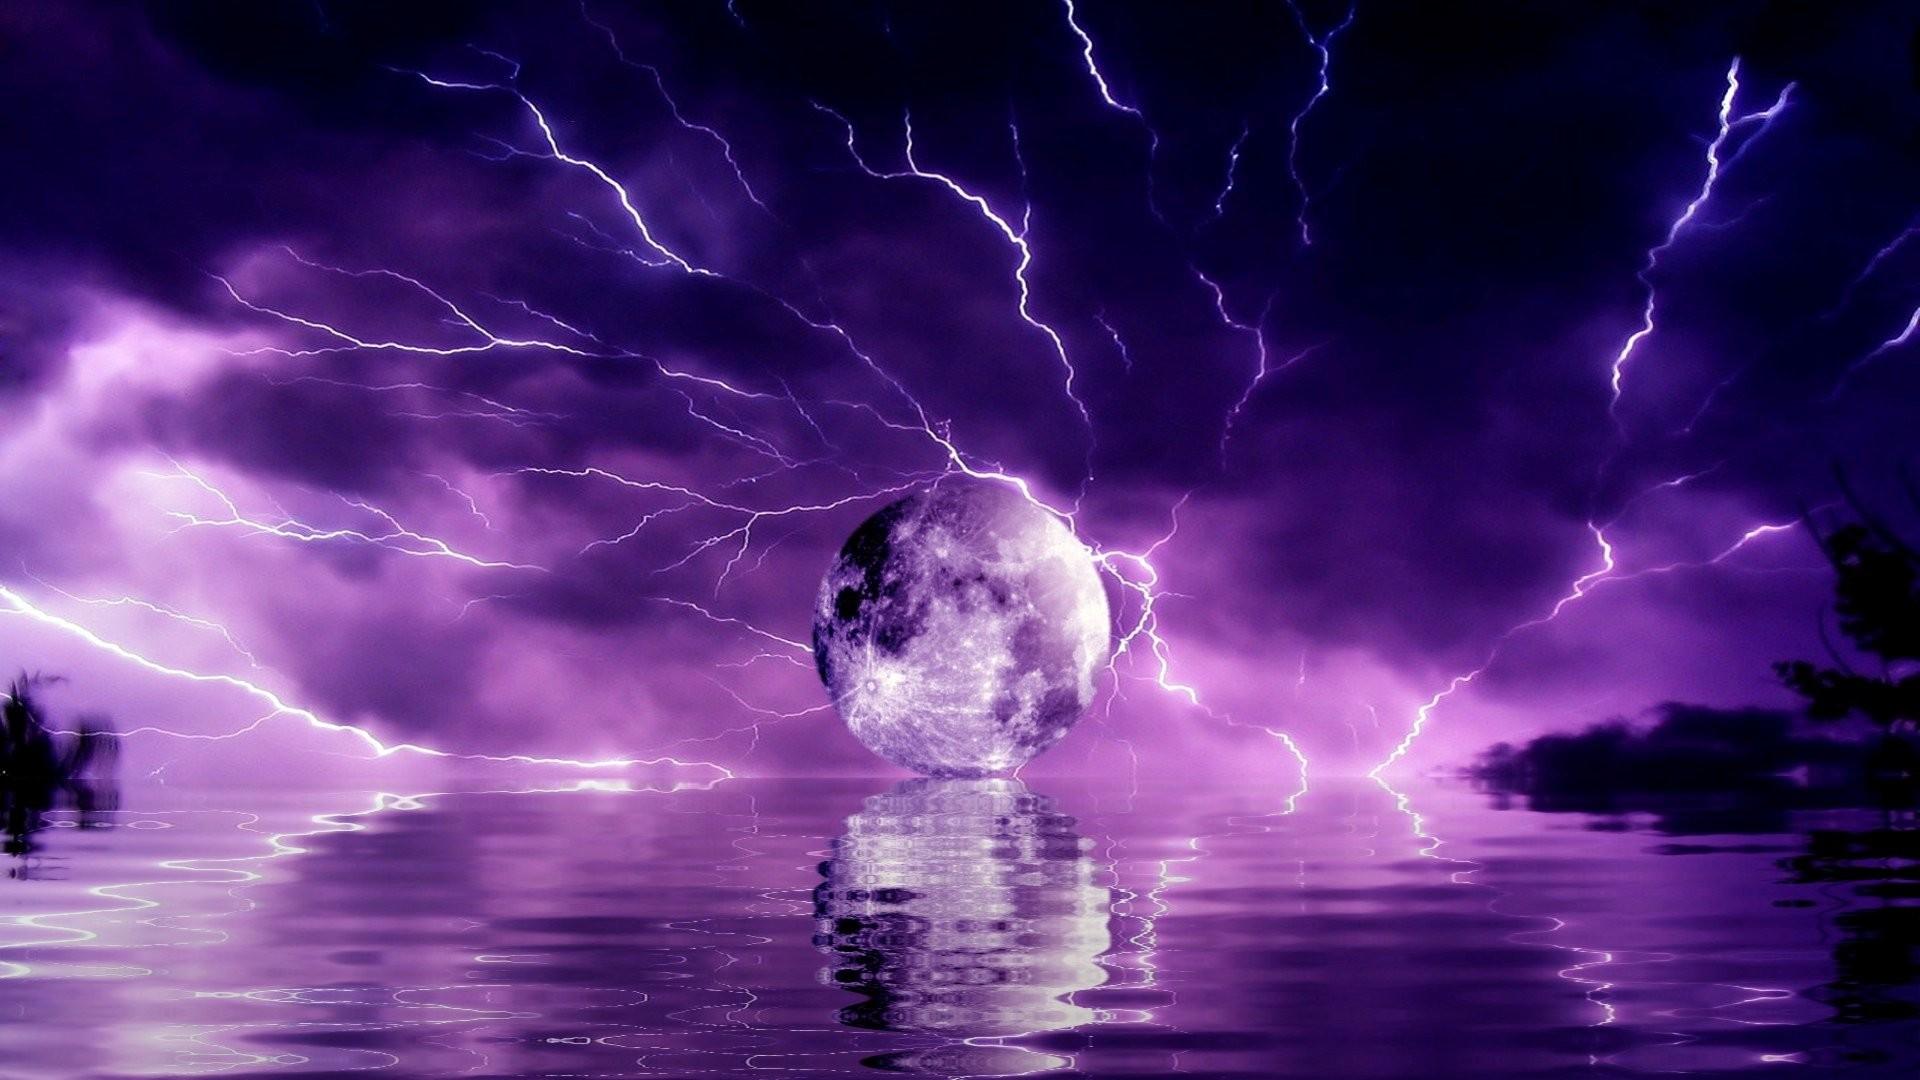 Storm Weather Rain Sky Clouds Nature Sea Ocean Moon Fantasy Sci-fi  Lightning Artwork Reflection Wallpaper At 3d Wallpapers